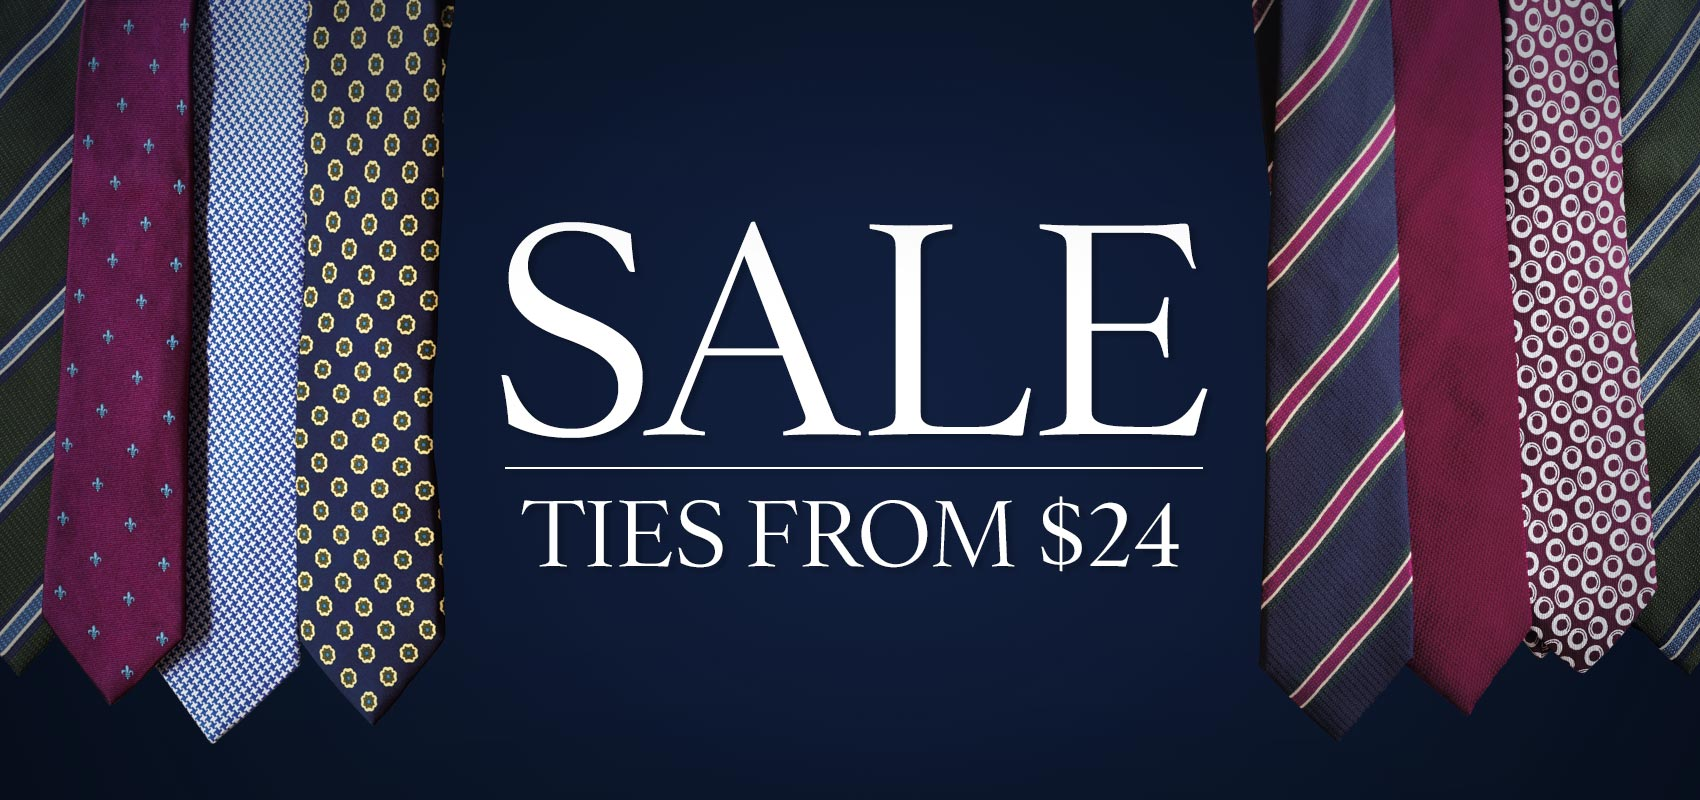 Charles Tyrwhitt Sale Ties from $24